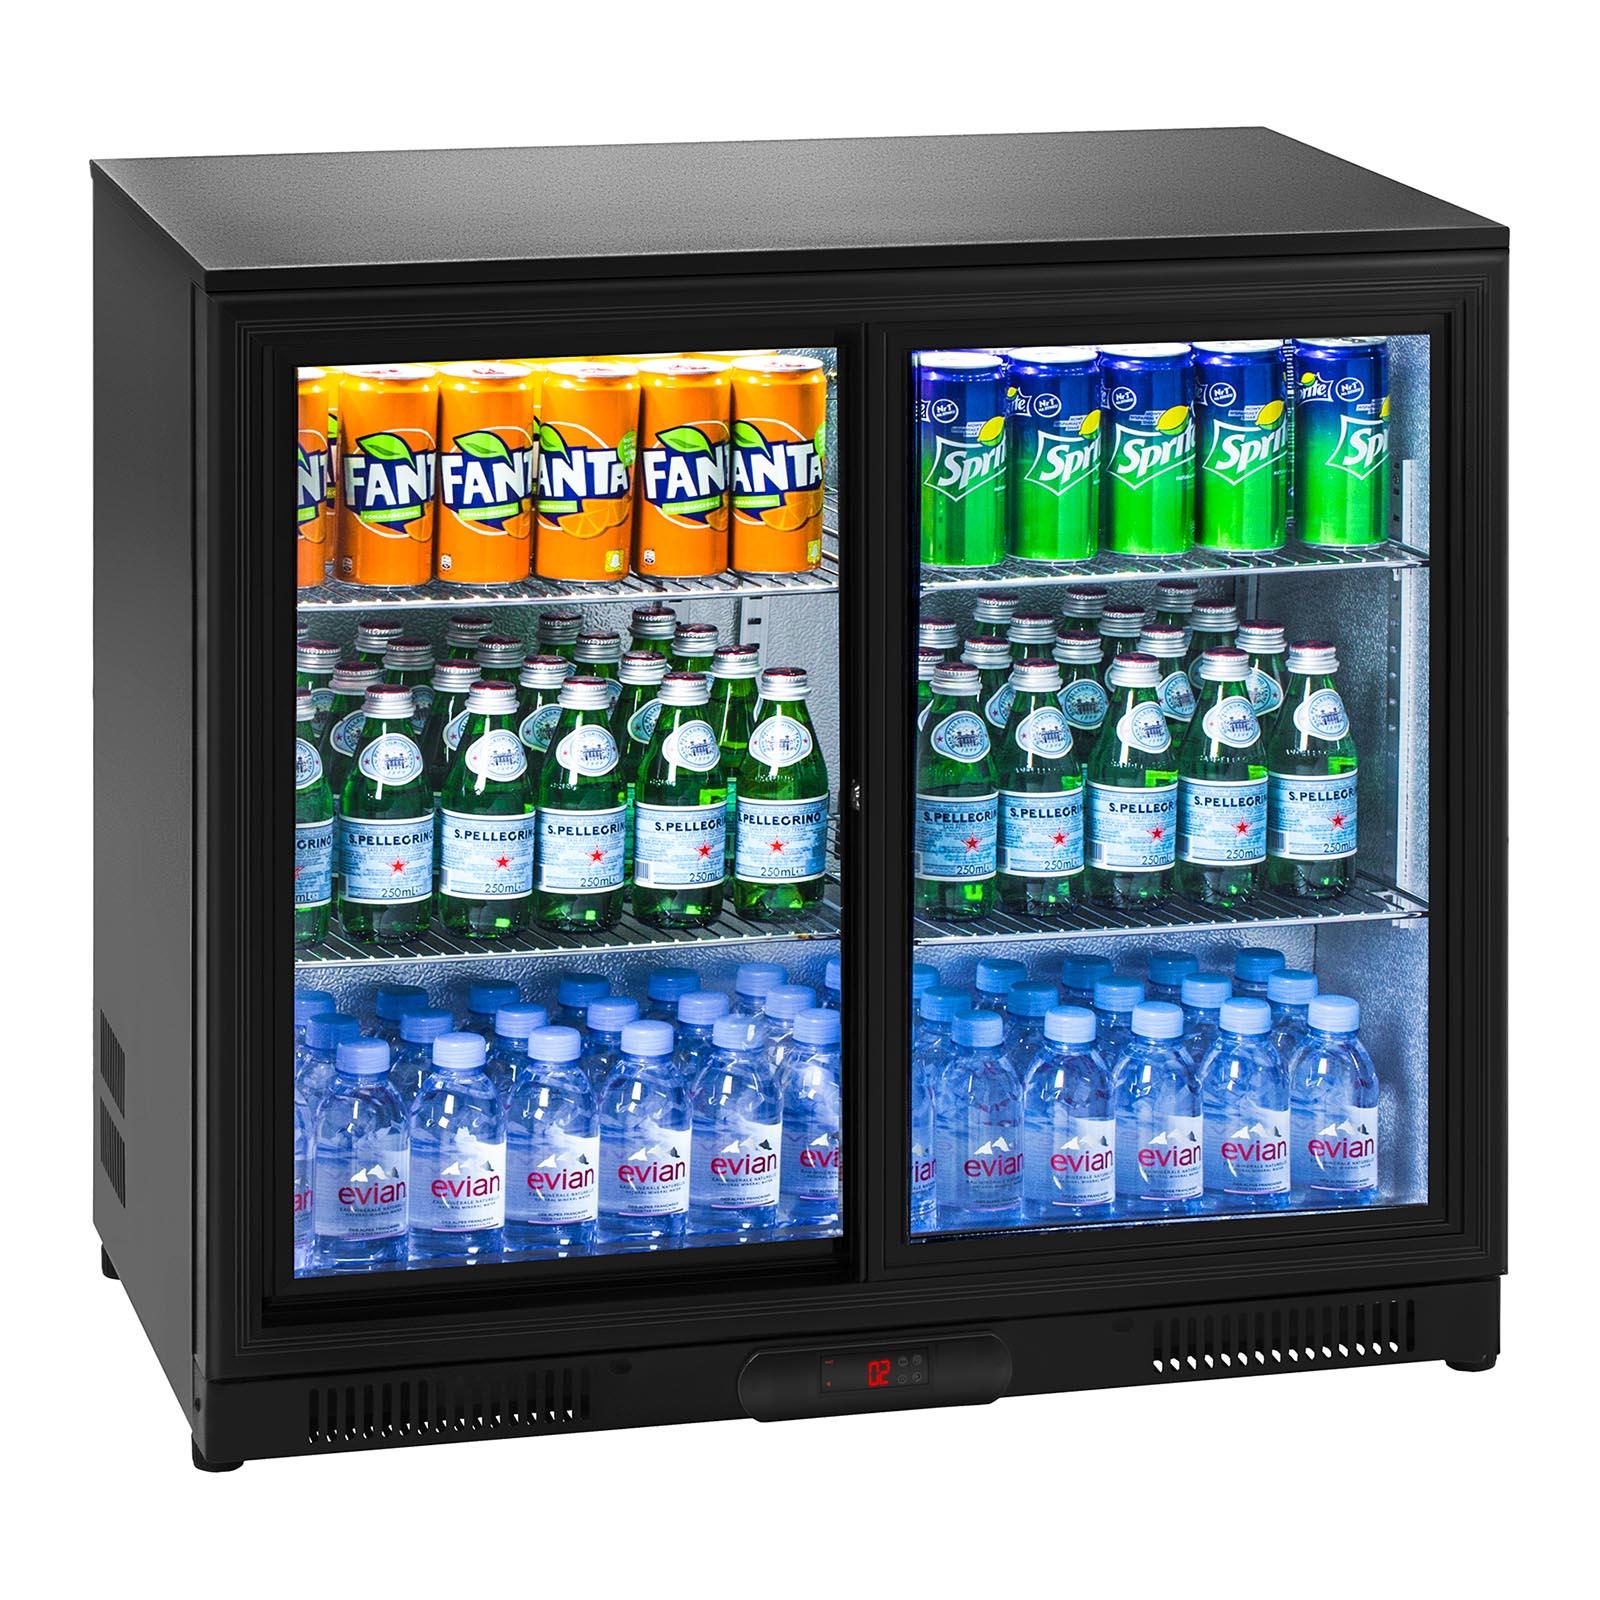 Mini Fridge Drinks Fridge Cooler Bottle Fridge Minibar